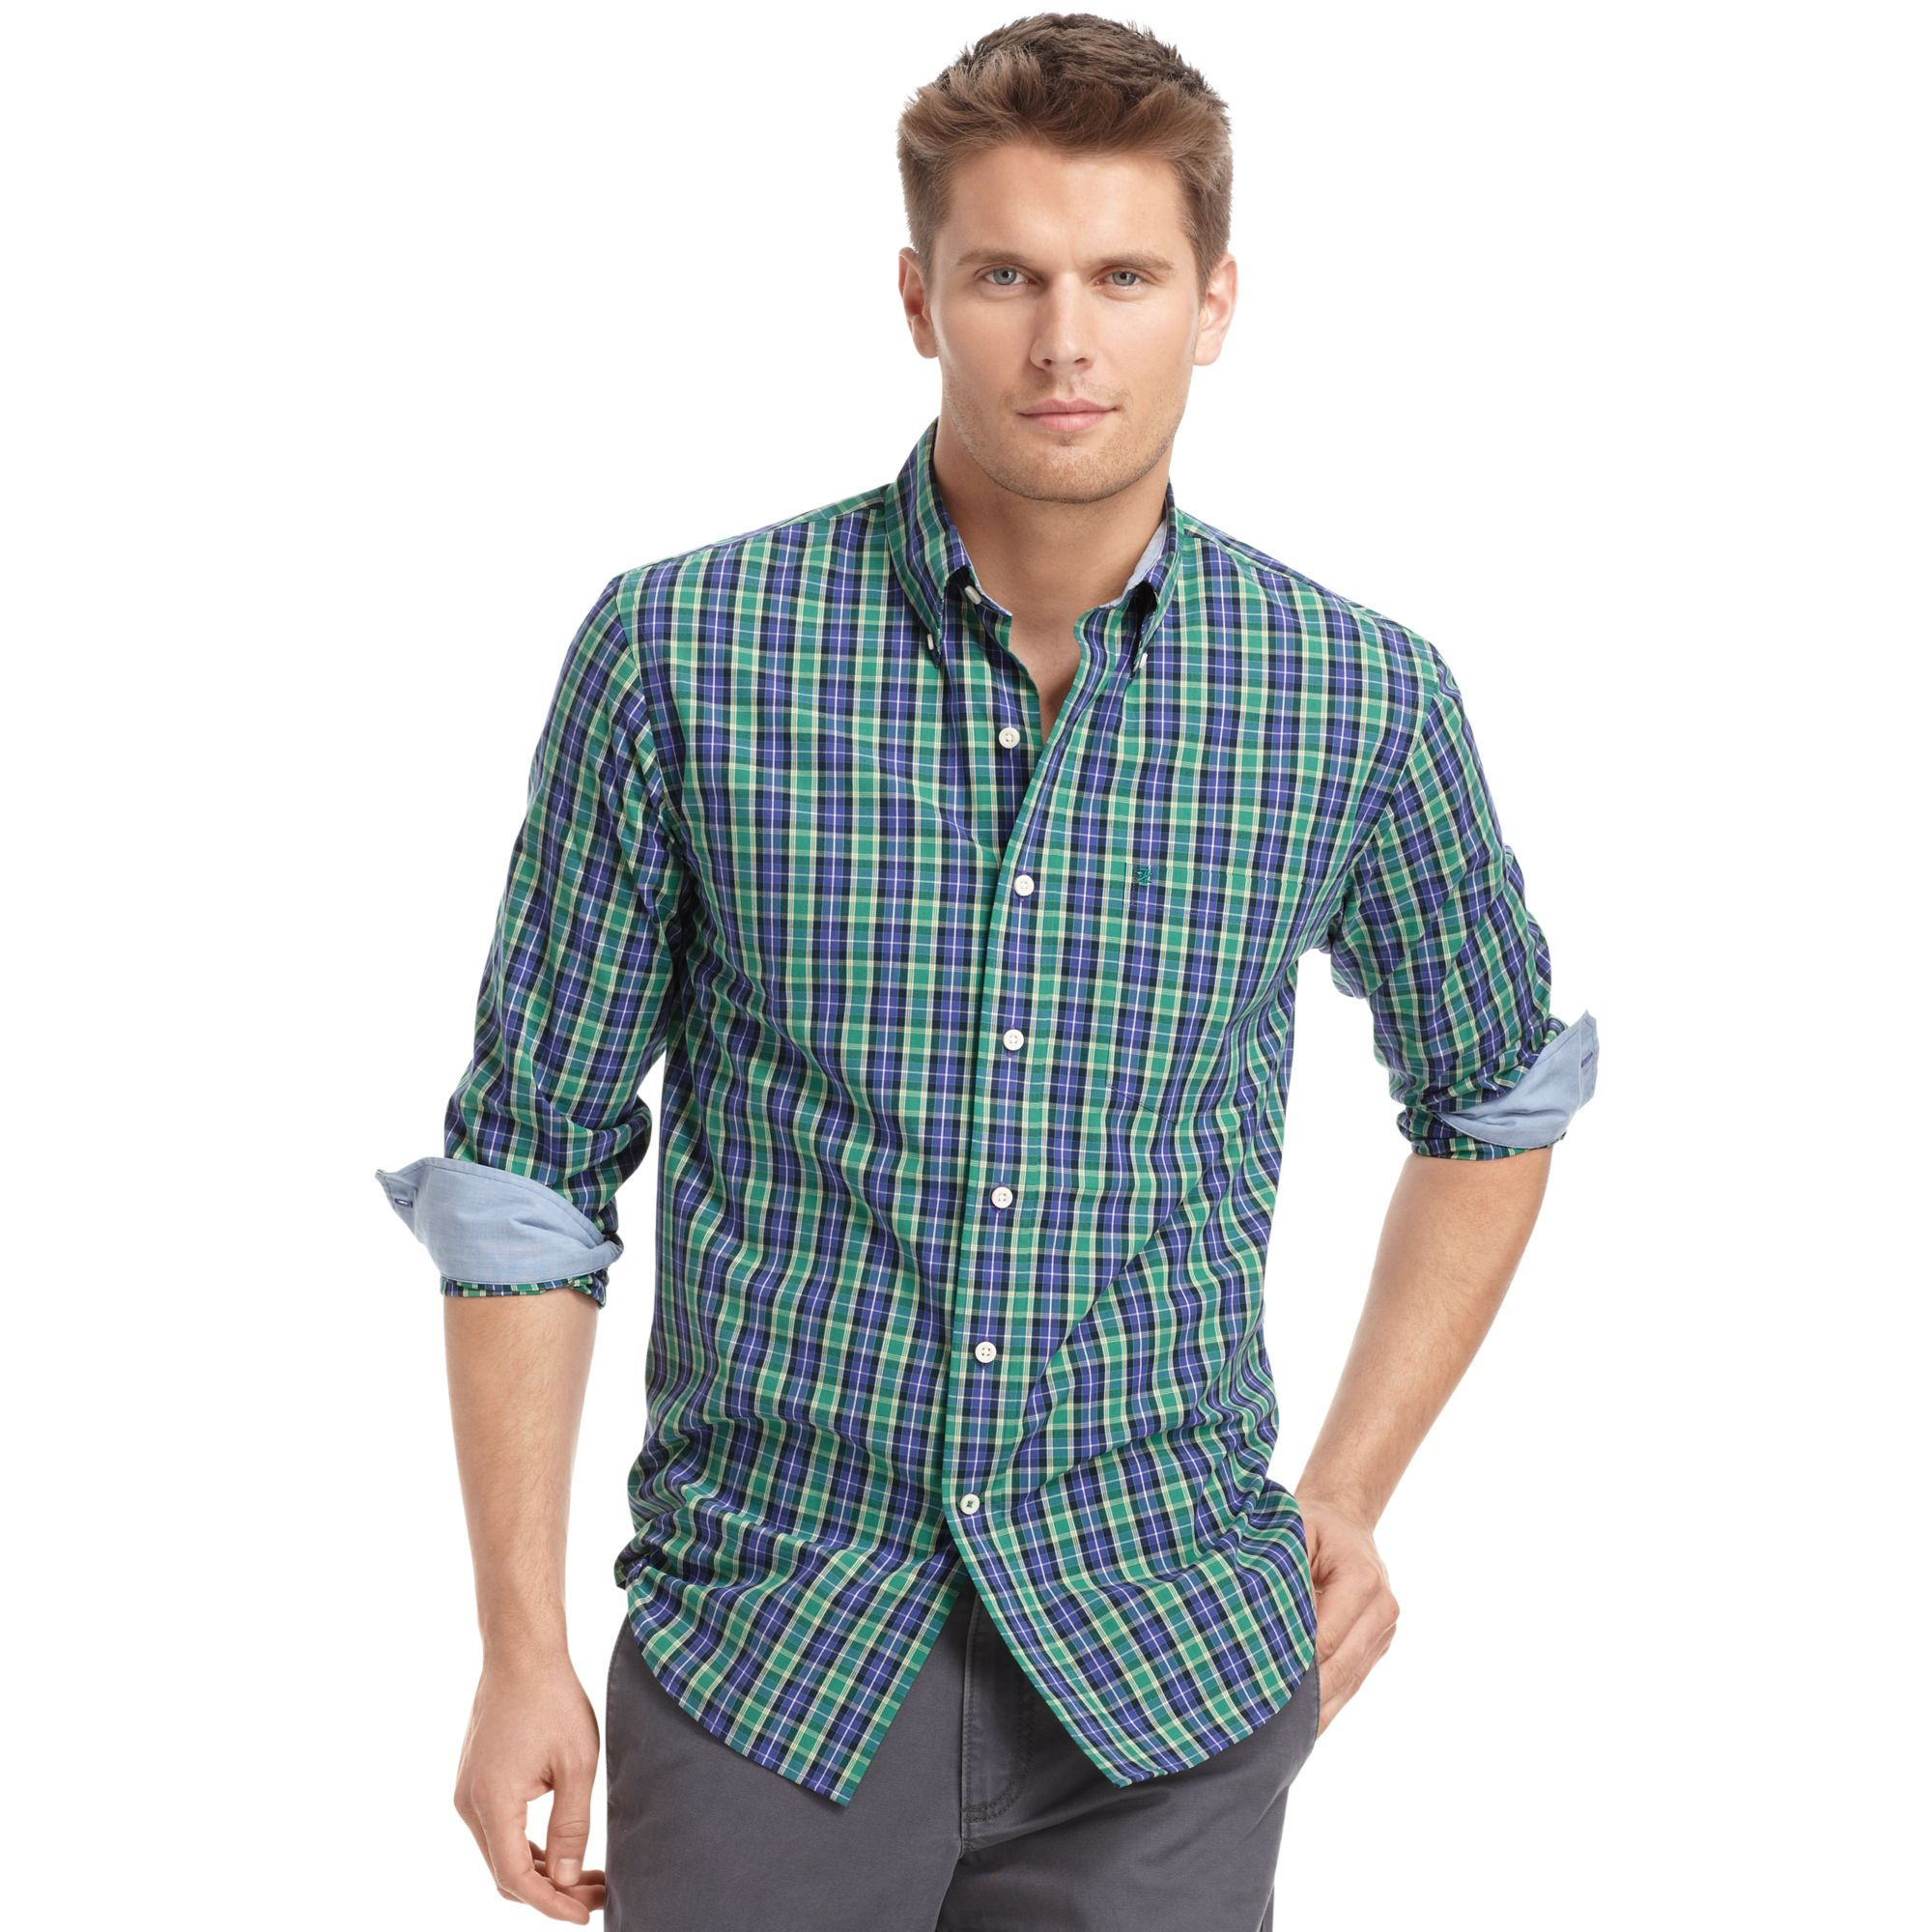 Izod izod big and tall shirt royal longsleeve tartan plaid for Izod big and tall shirts